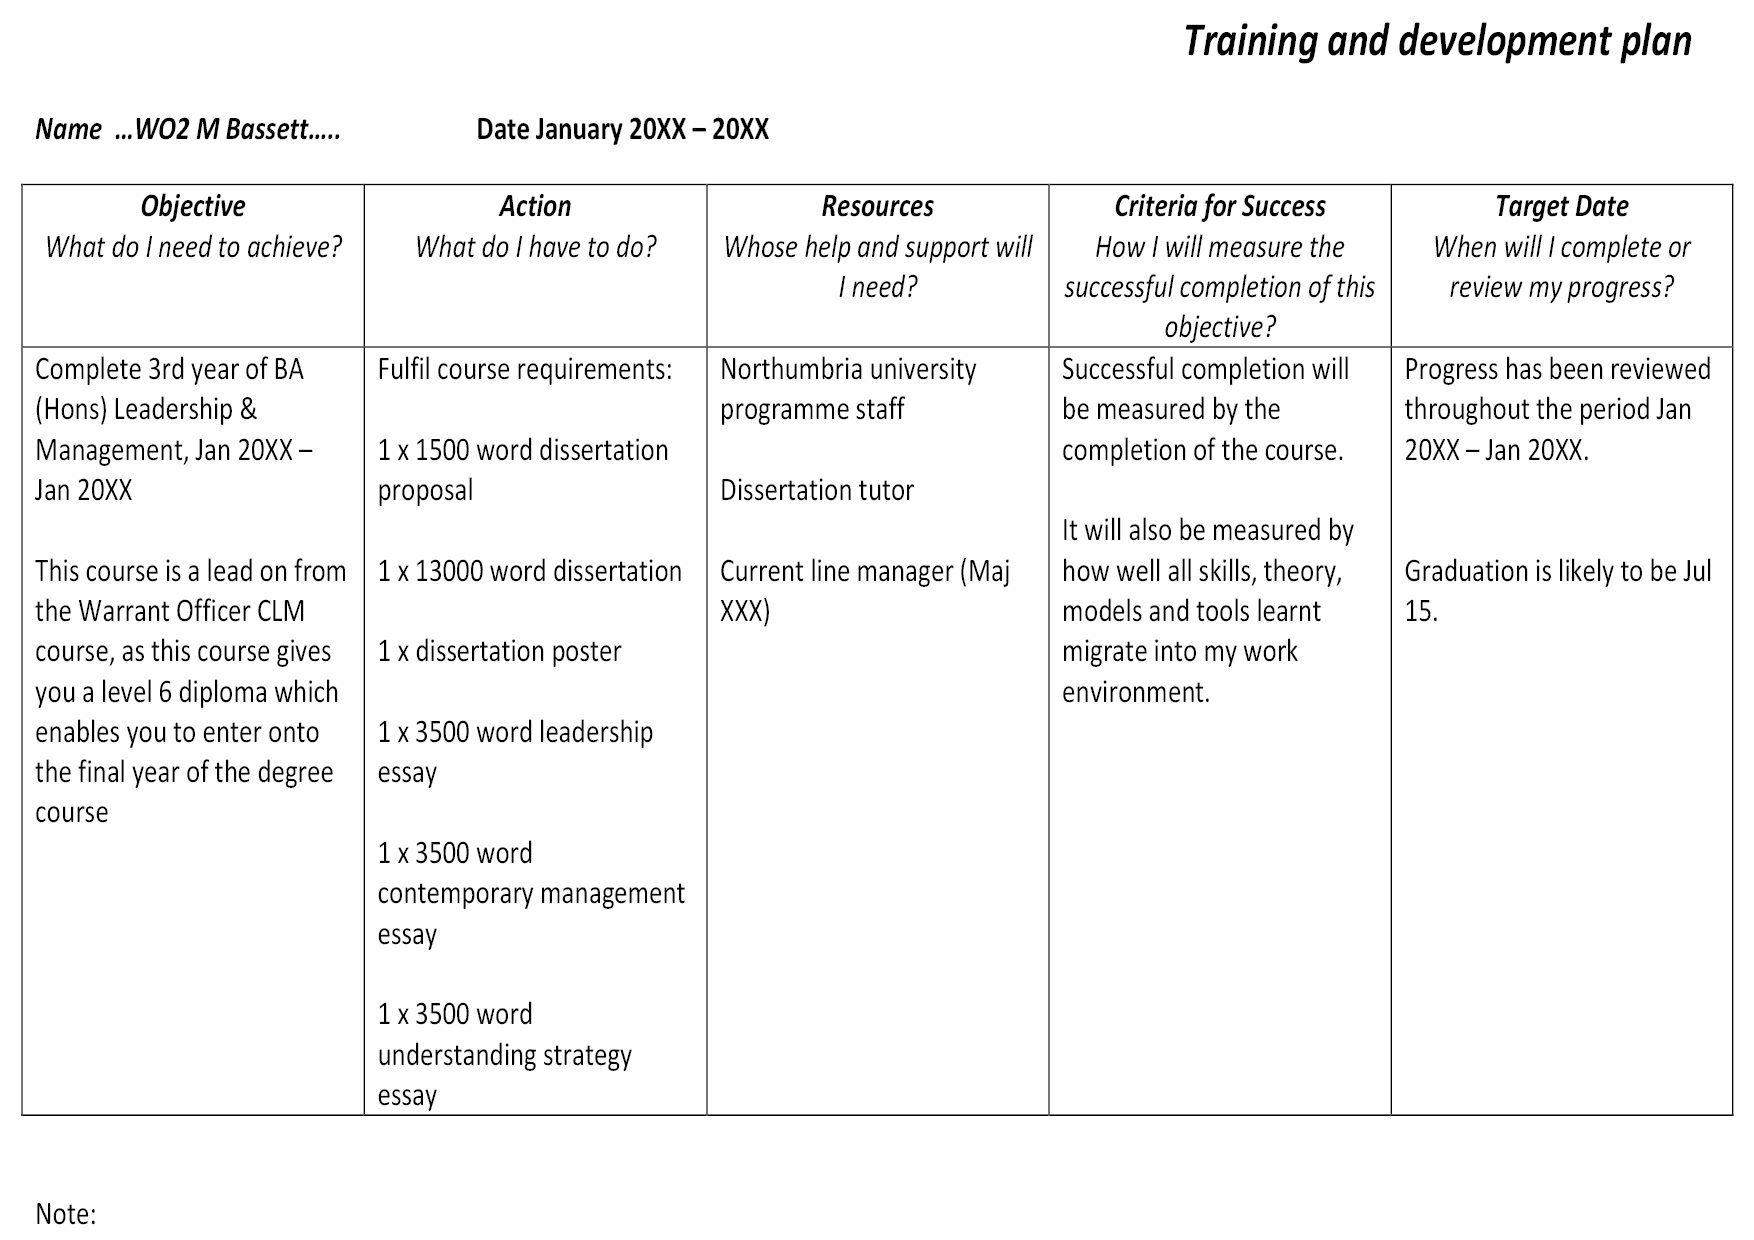 009 Shocking Professional Development Plan Template For Nurse Design  Nurses Sample Goal ExampleFull